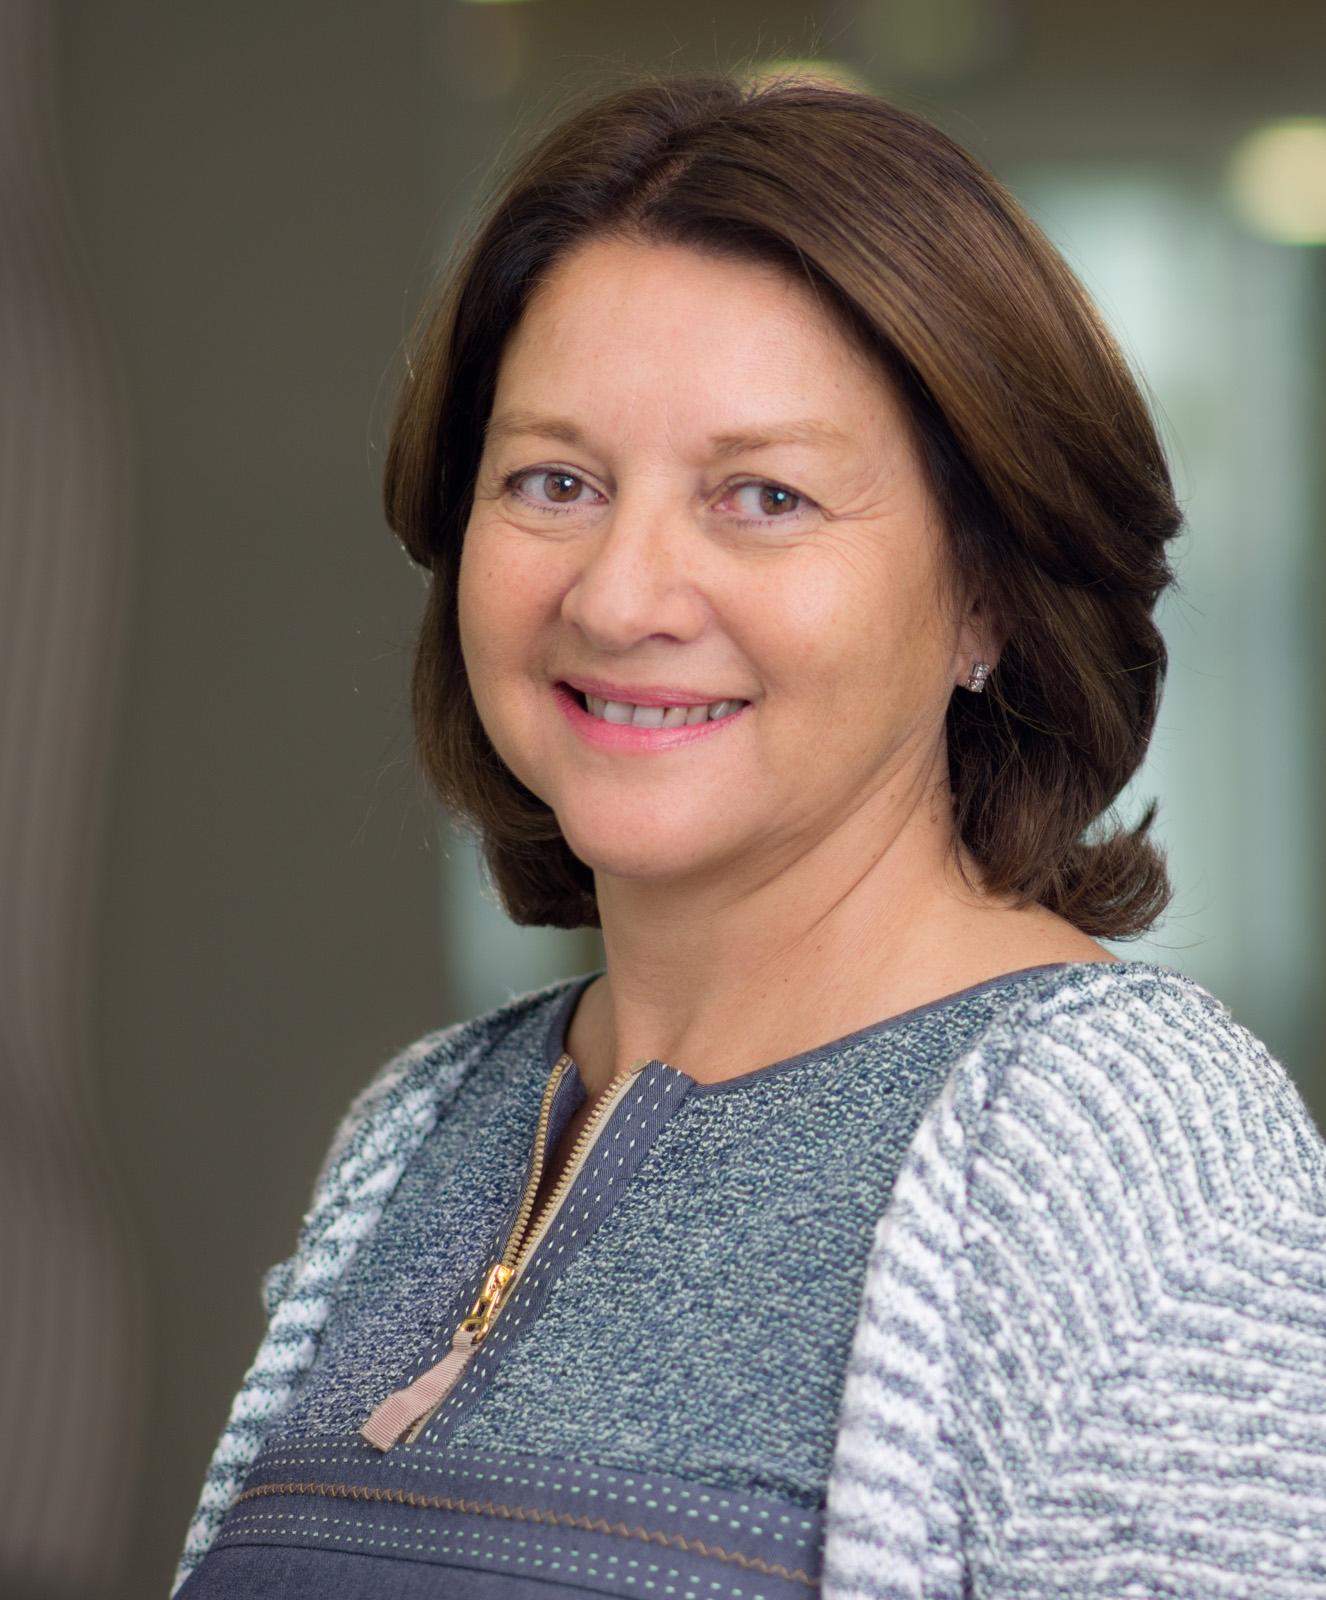 Marie-Christine Ducholet